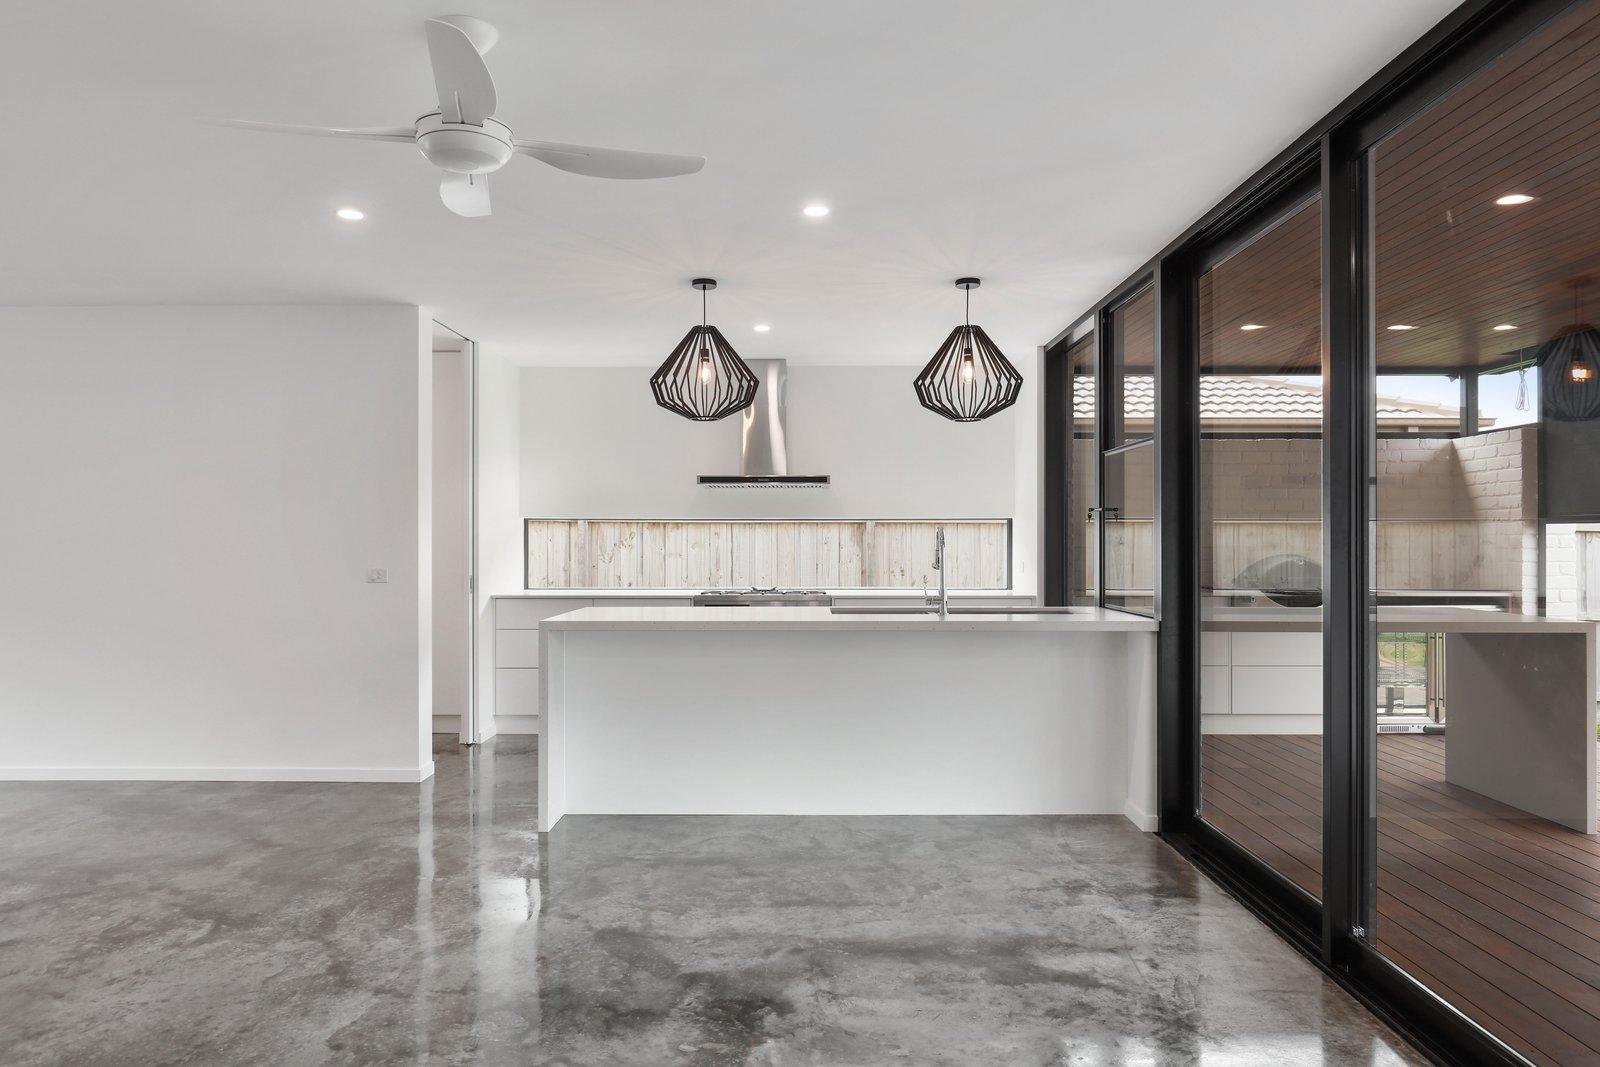 Wood Railing, Wood Tread, Dining Room, Concrete Floor, Pendant Lighting, and Recessed Lighting  Tamara Crecsent by Inverloch 3996